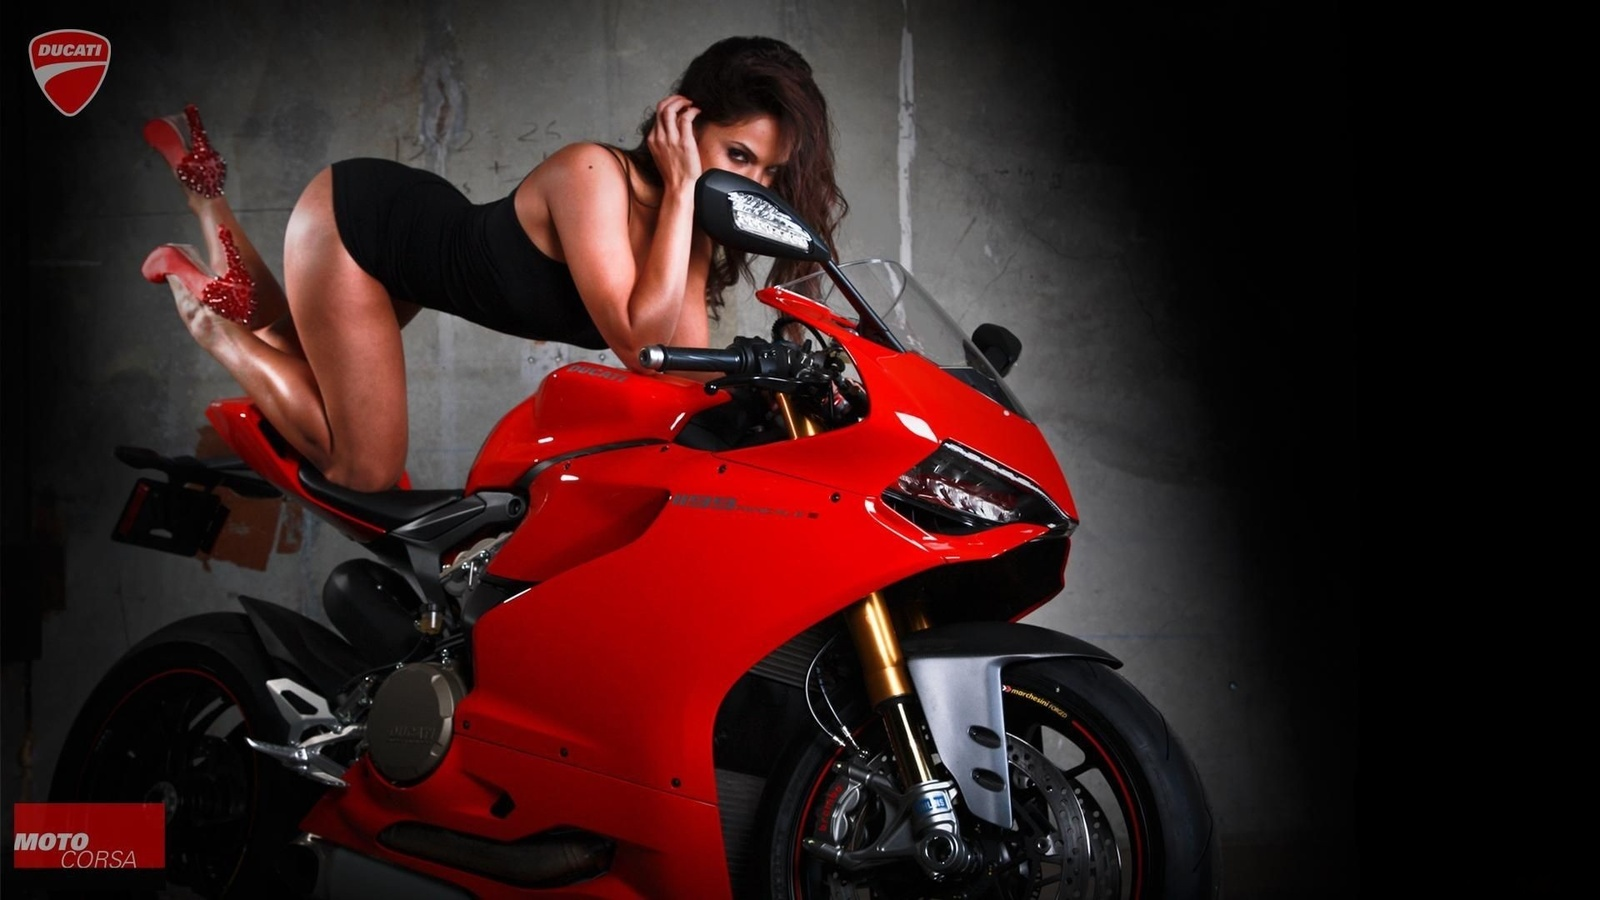 мотоцикл, красный, байк, девушка